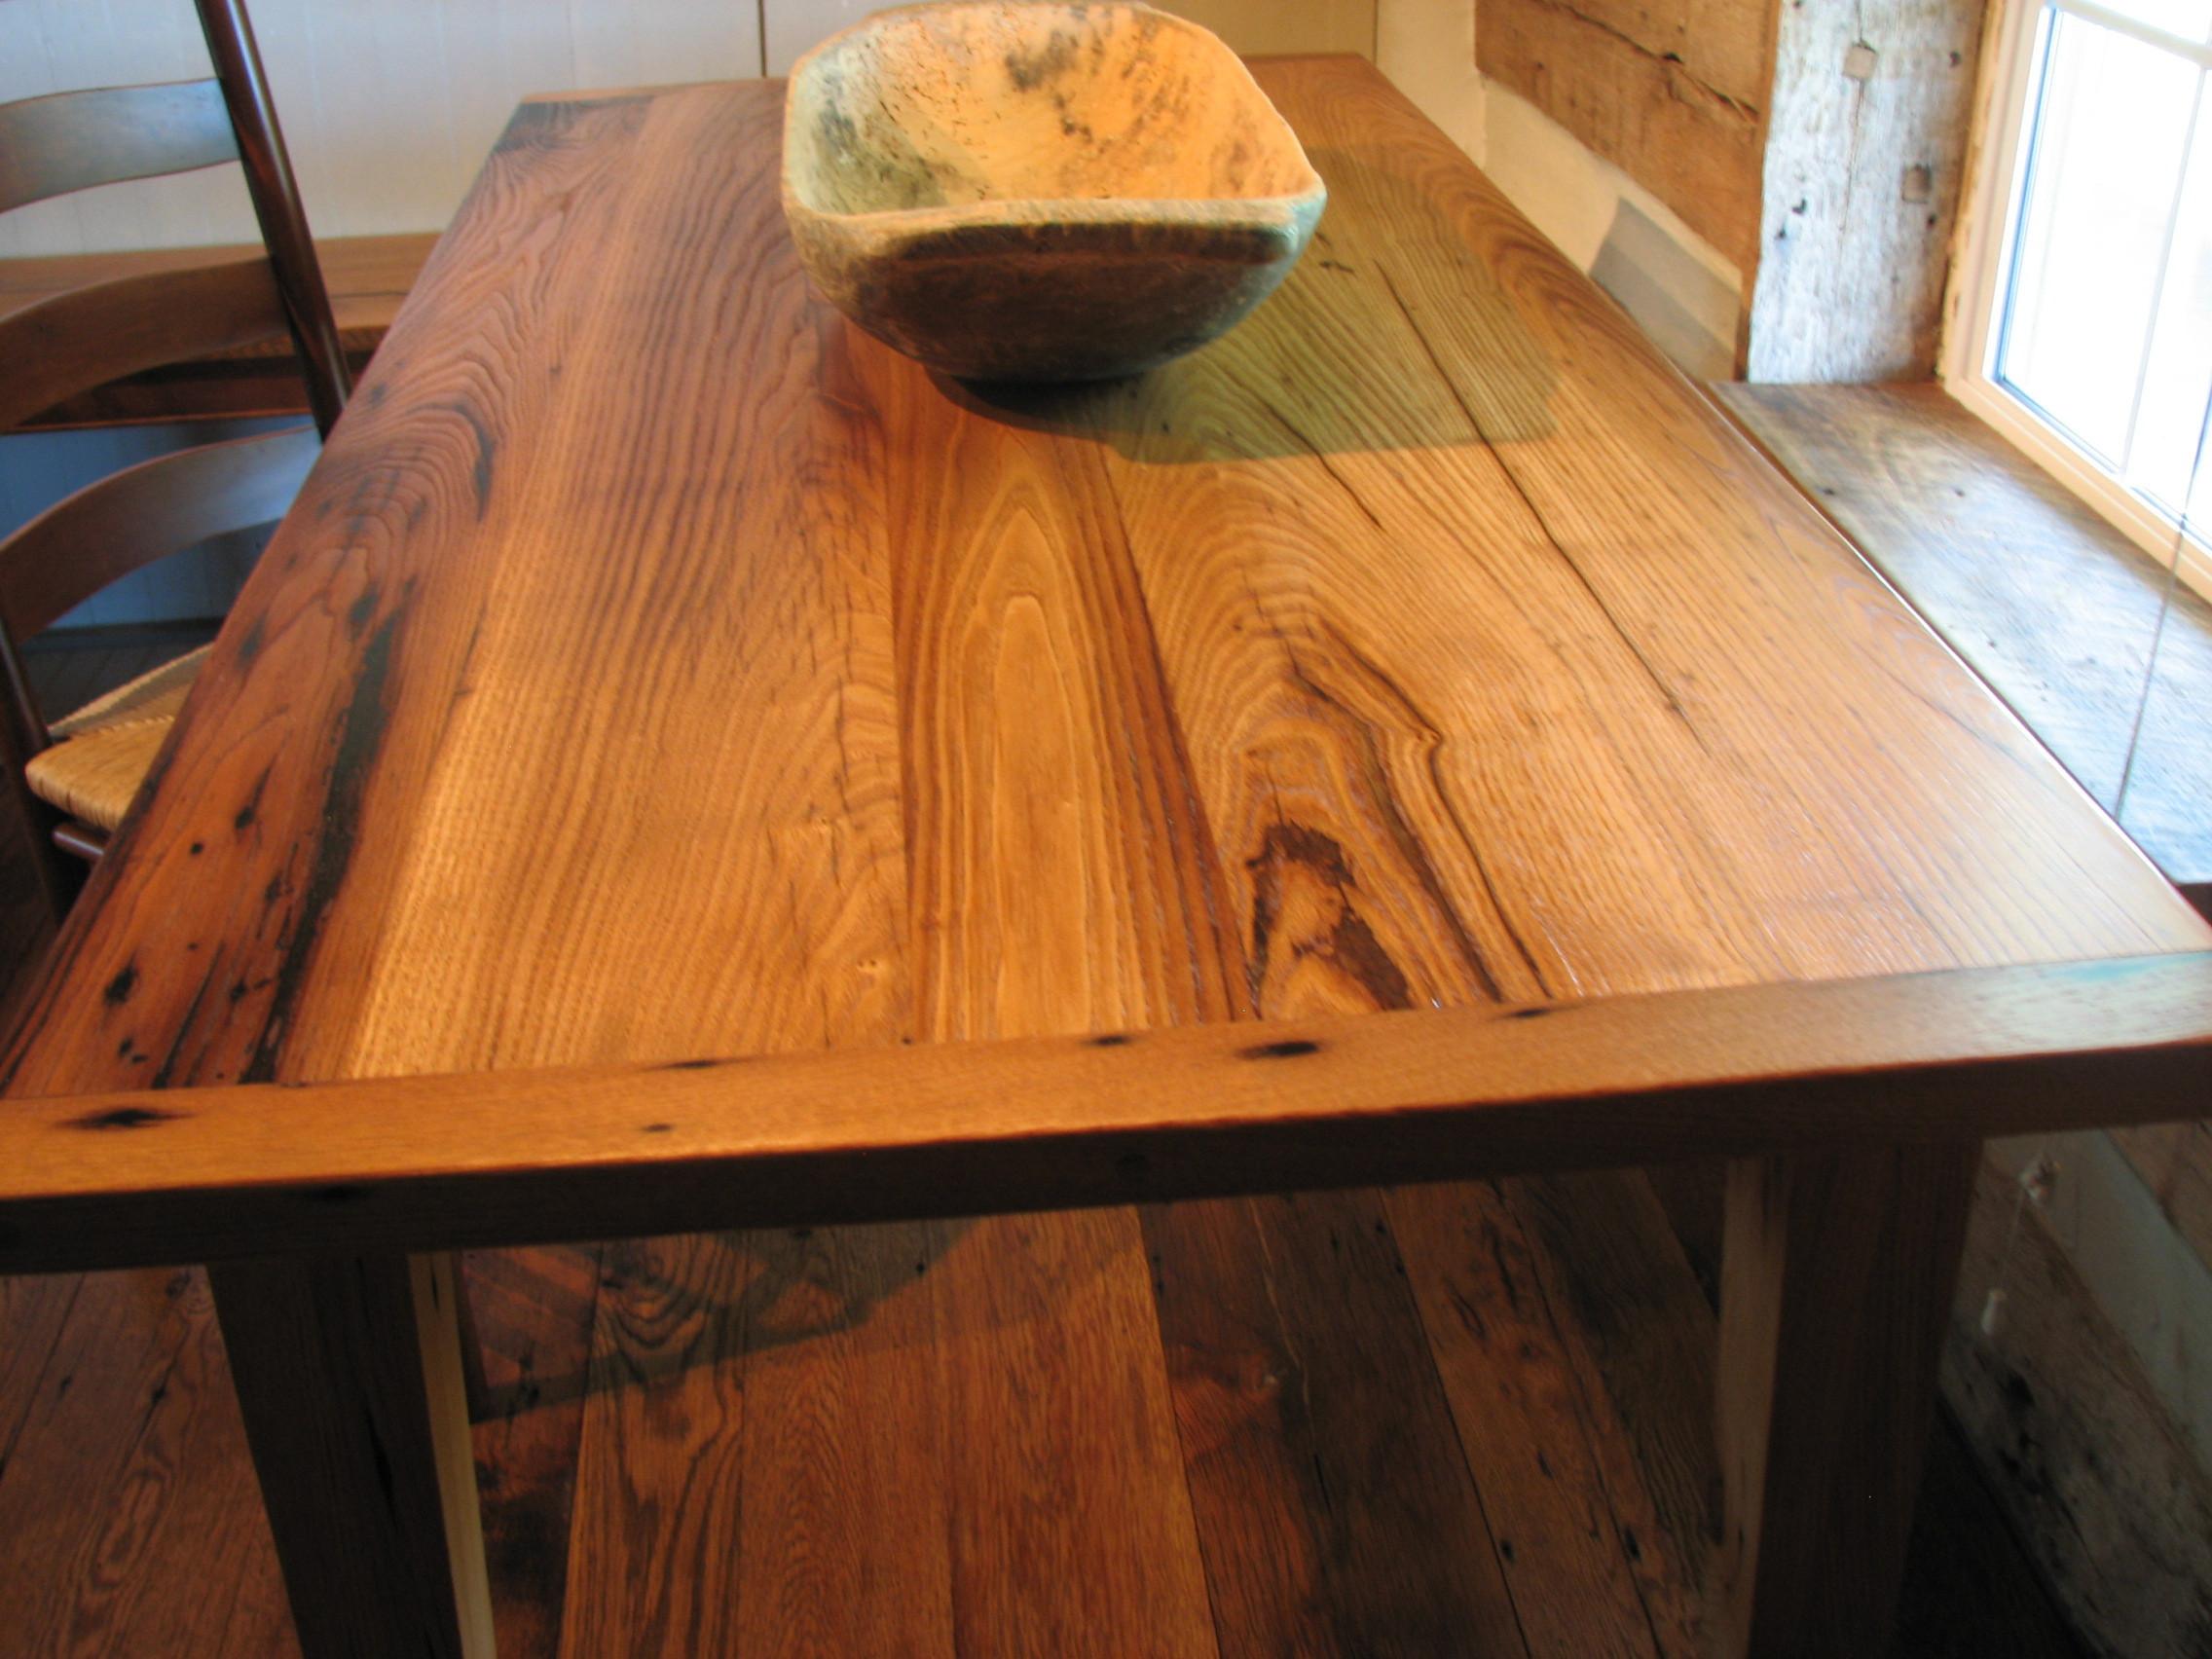 reclaimed hardwood flooring uk of the wood maker page 2 wood wallpaper regarding rustic solid oak extending dining table concepts of reclaimed wood flooring